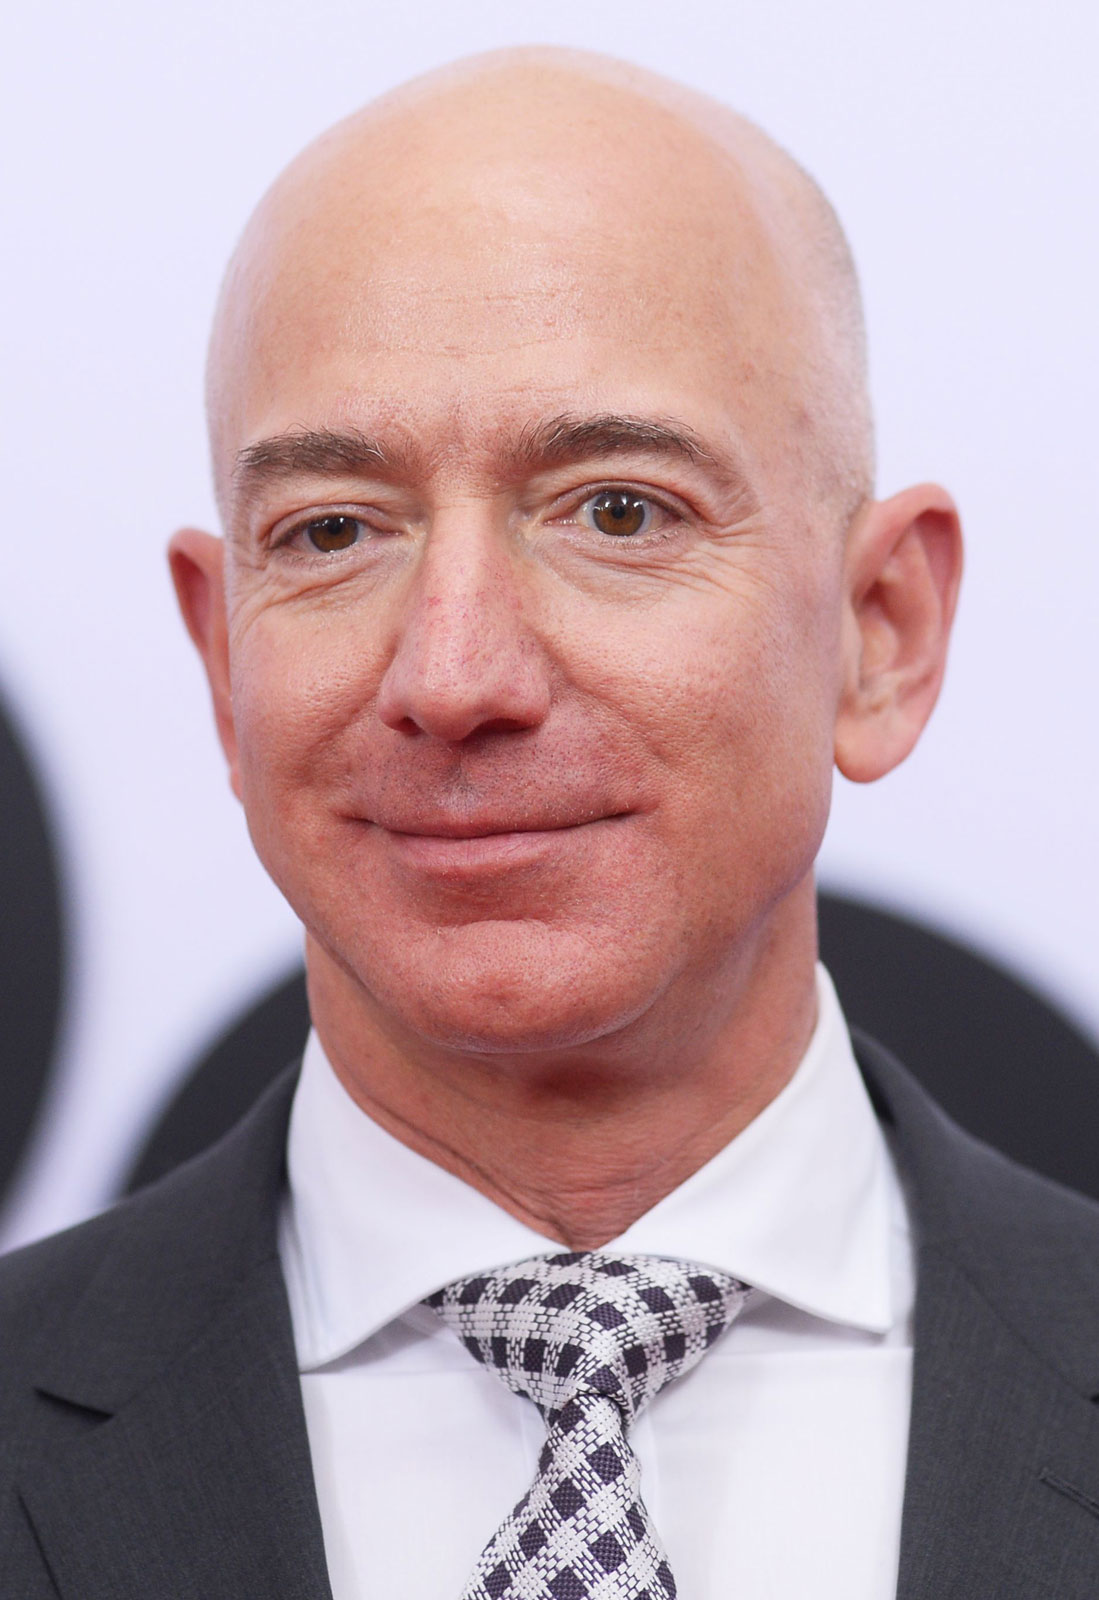 Jeff-Bezos-2017.png